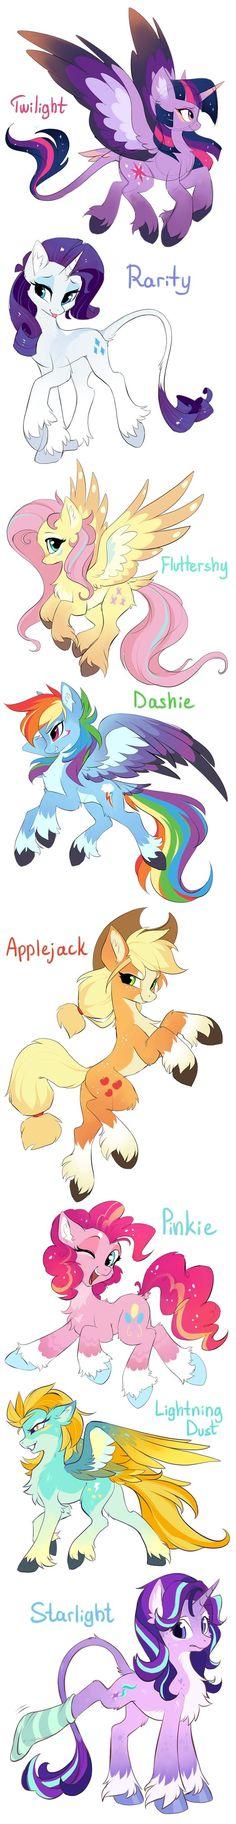 mlp my little pony rainbow dash Dessin My Little Pony, My Little Pony Comic, My Little Pony Drawing, My Little Pony Pictures, Rainbow Dash, Filles Equestria, My Little Pony Wallpaper, Little Poni, Mlp Fan Art